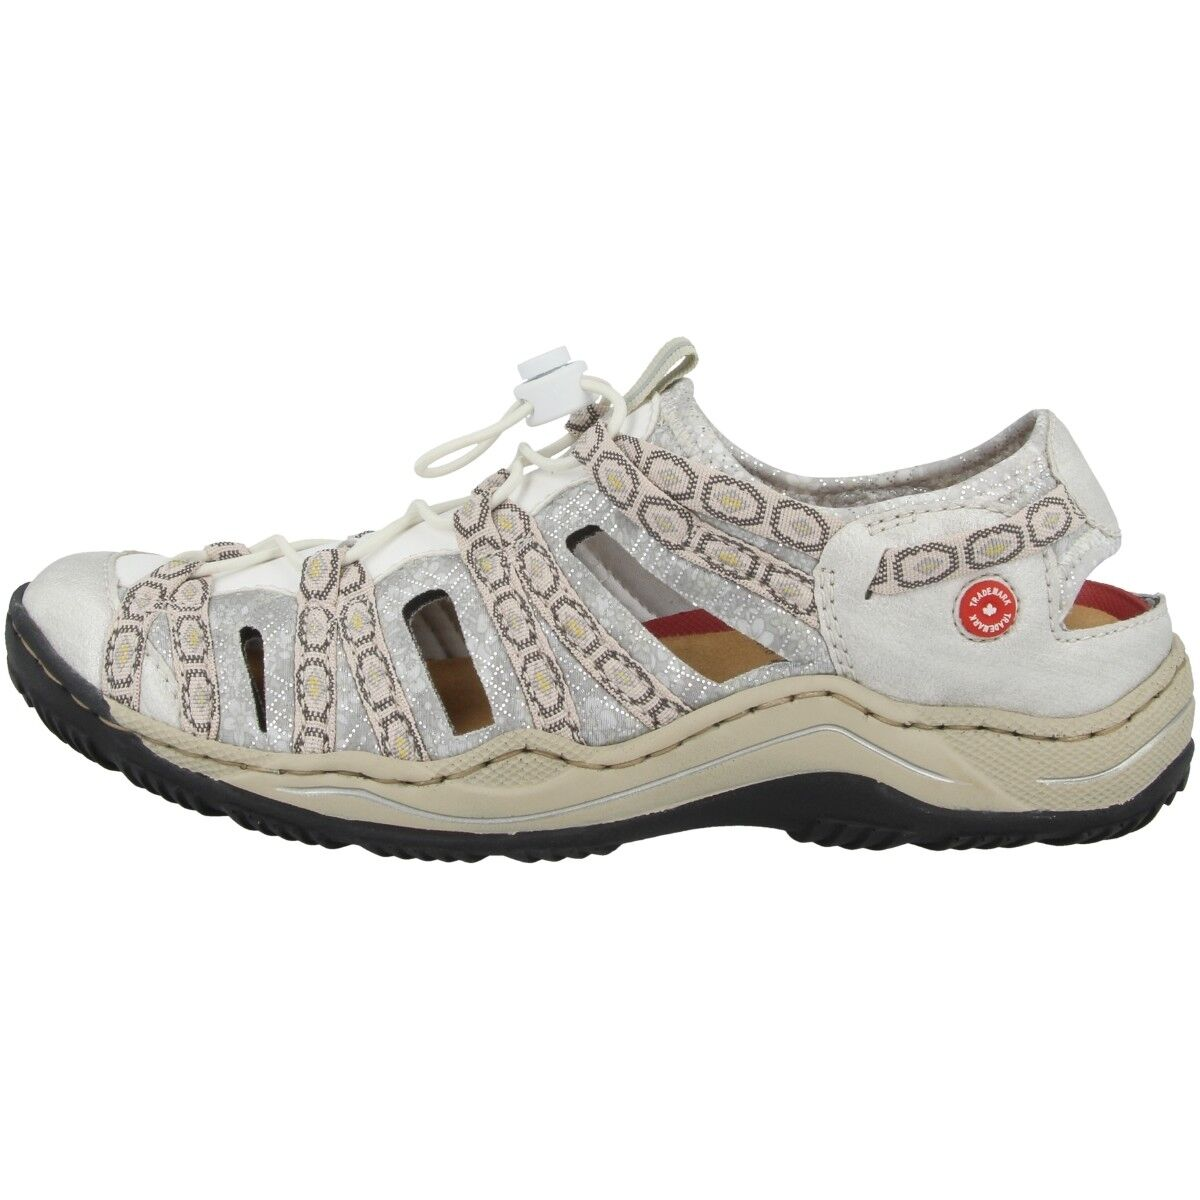 Rieker Caprina-Alabama-Wintu-Scuba Schuhe Antistress Sling Sandalen L0577-80